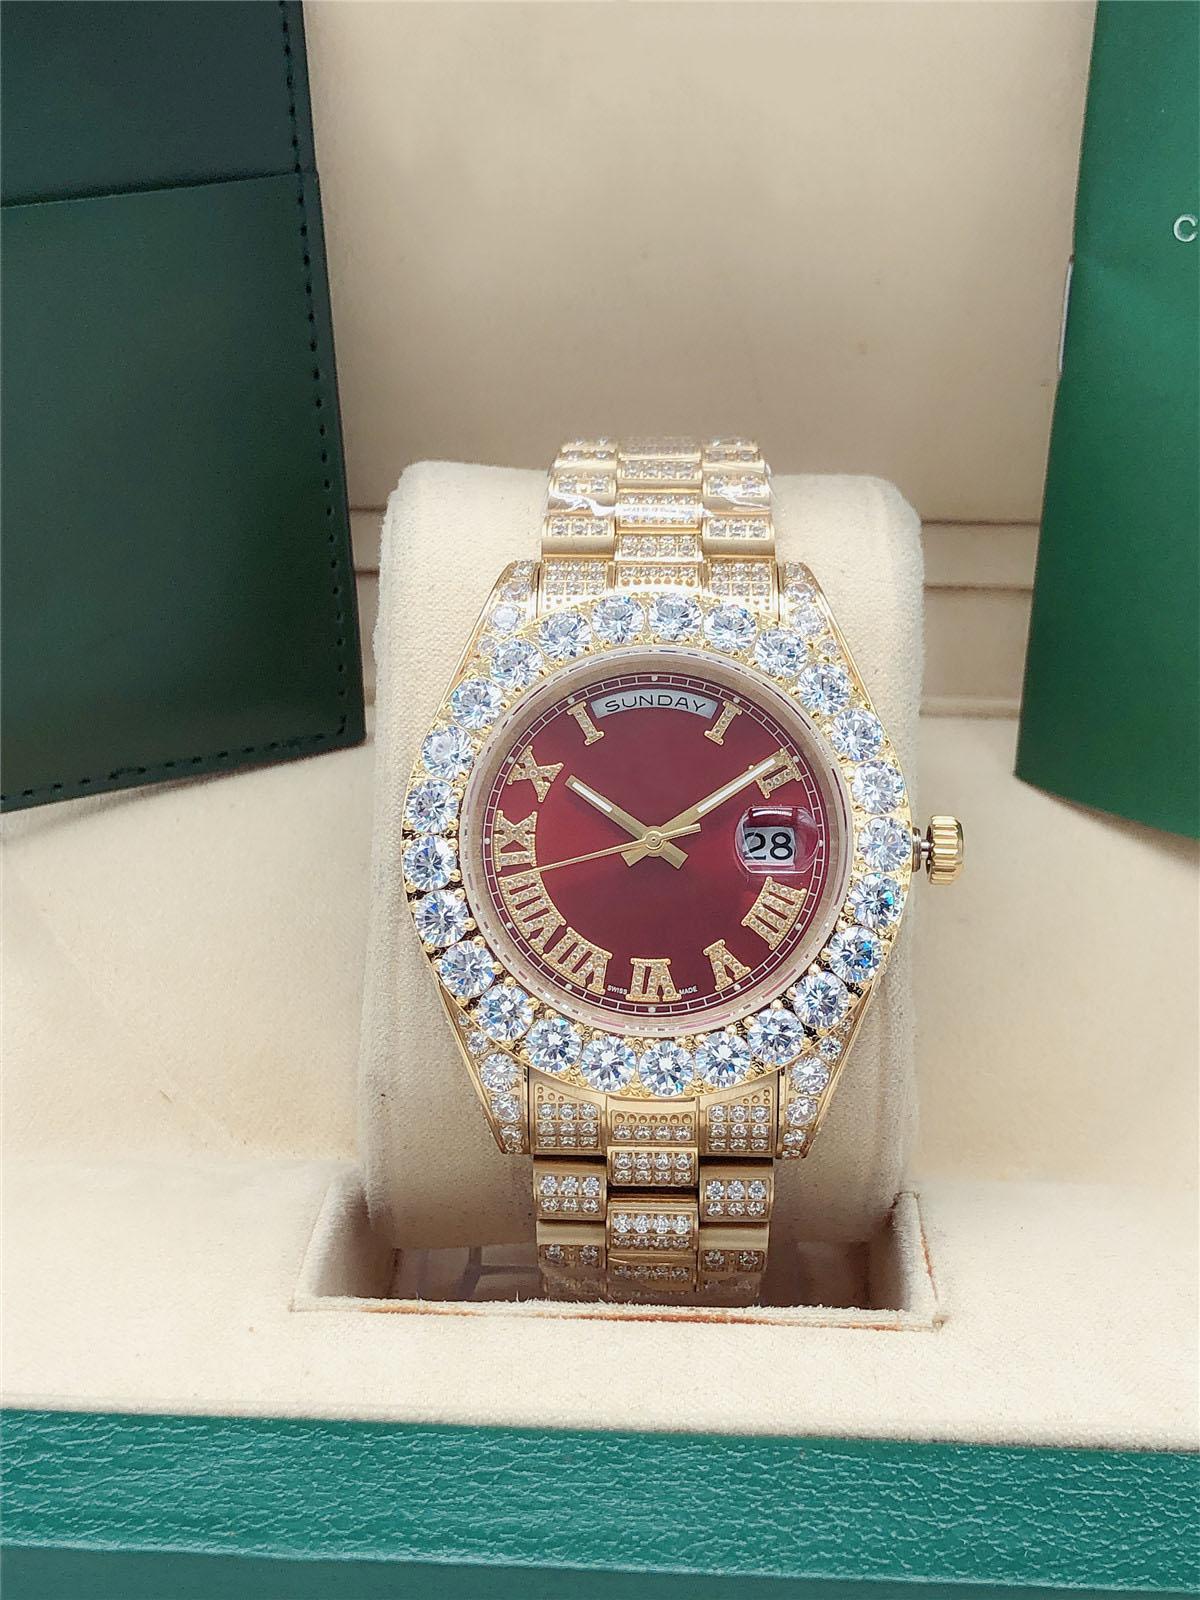 Luxury U1 Factory 11 style Full diamond President Day Date Watch 218238 Big Diamond Bezel 43mm Roman dial Yellow Gold men men's 2813 automatic Wristwatch red dail